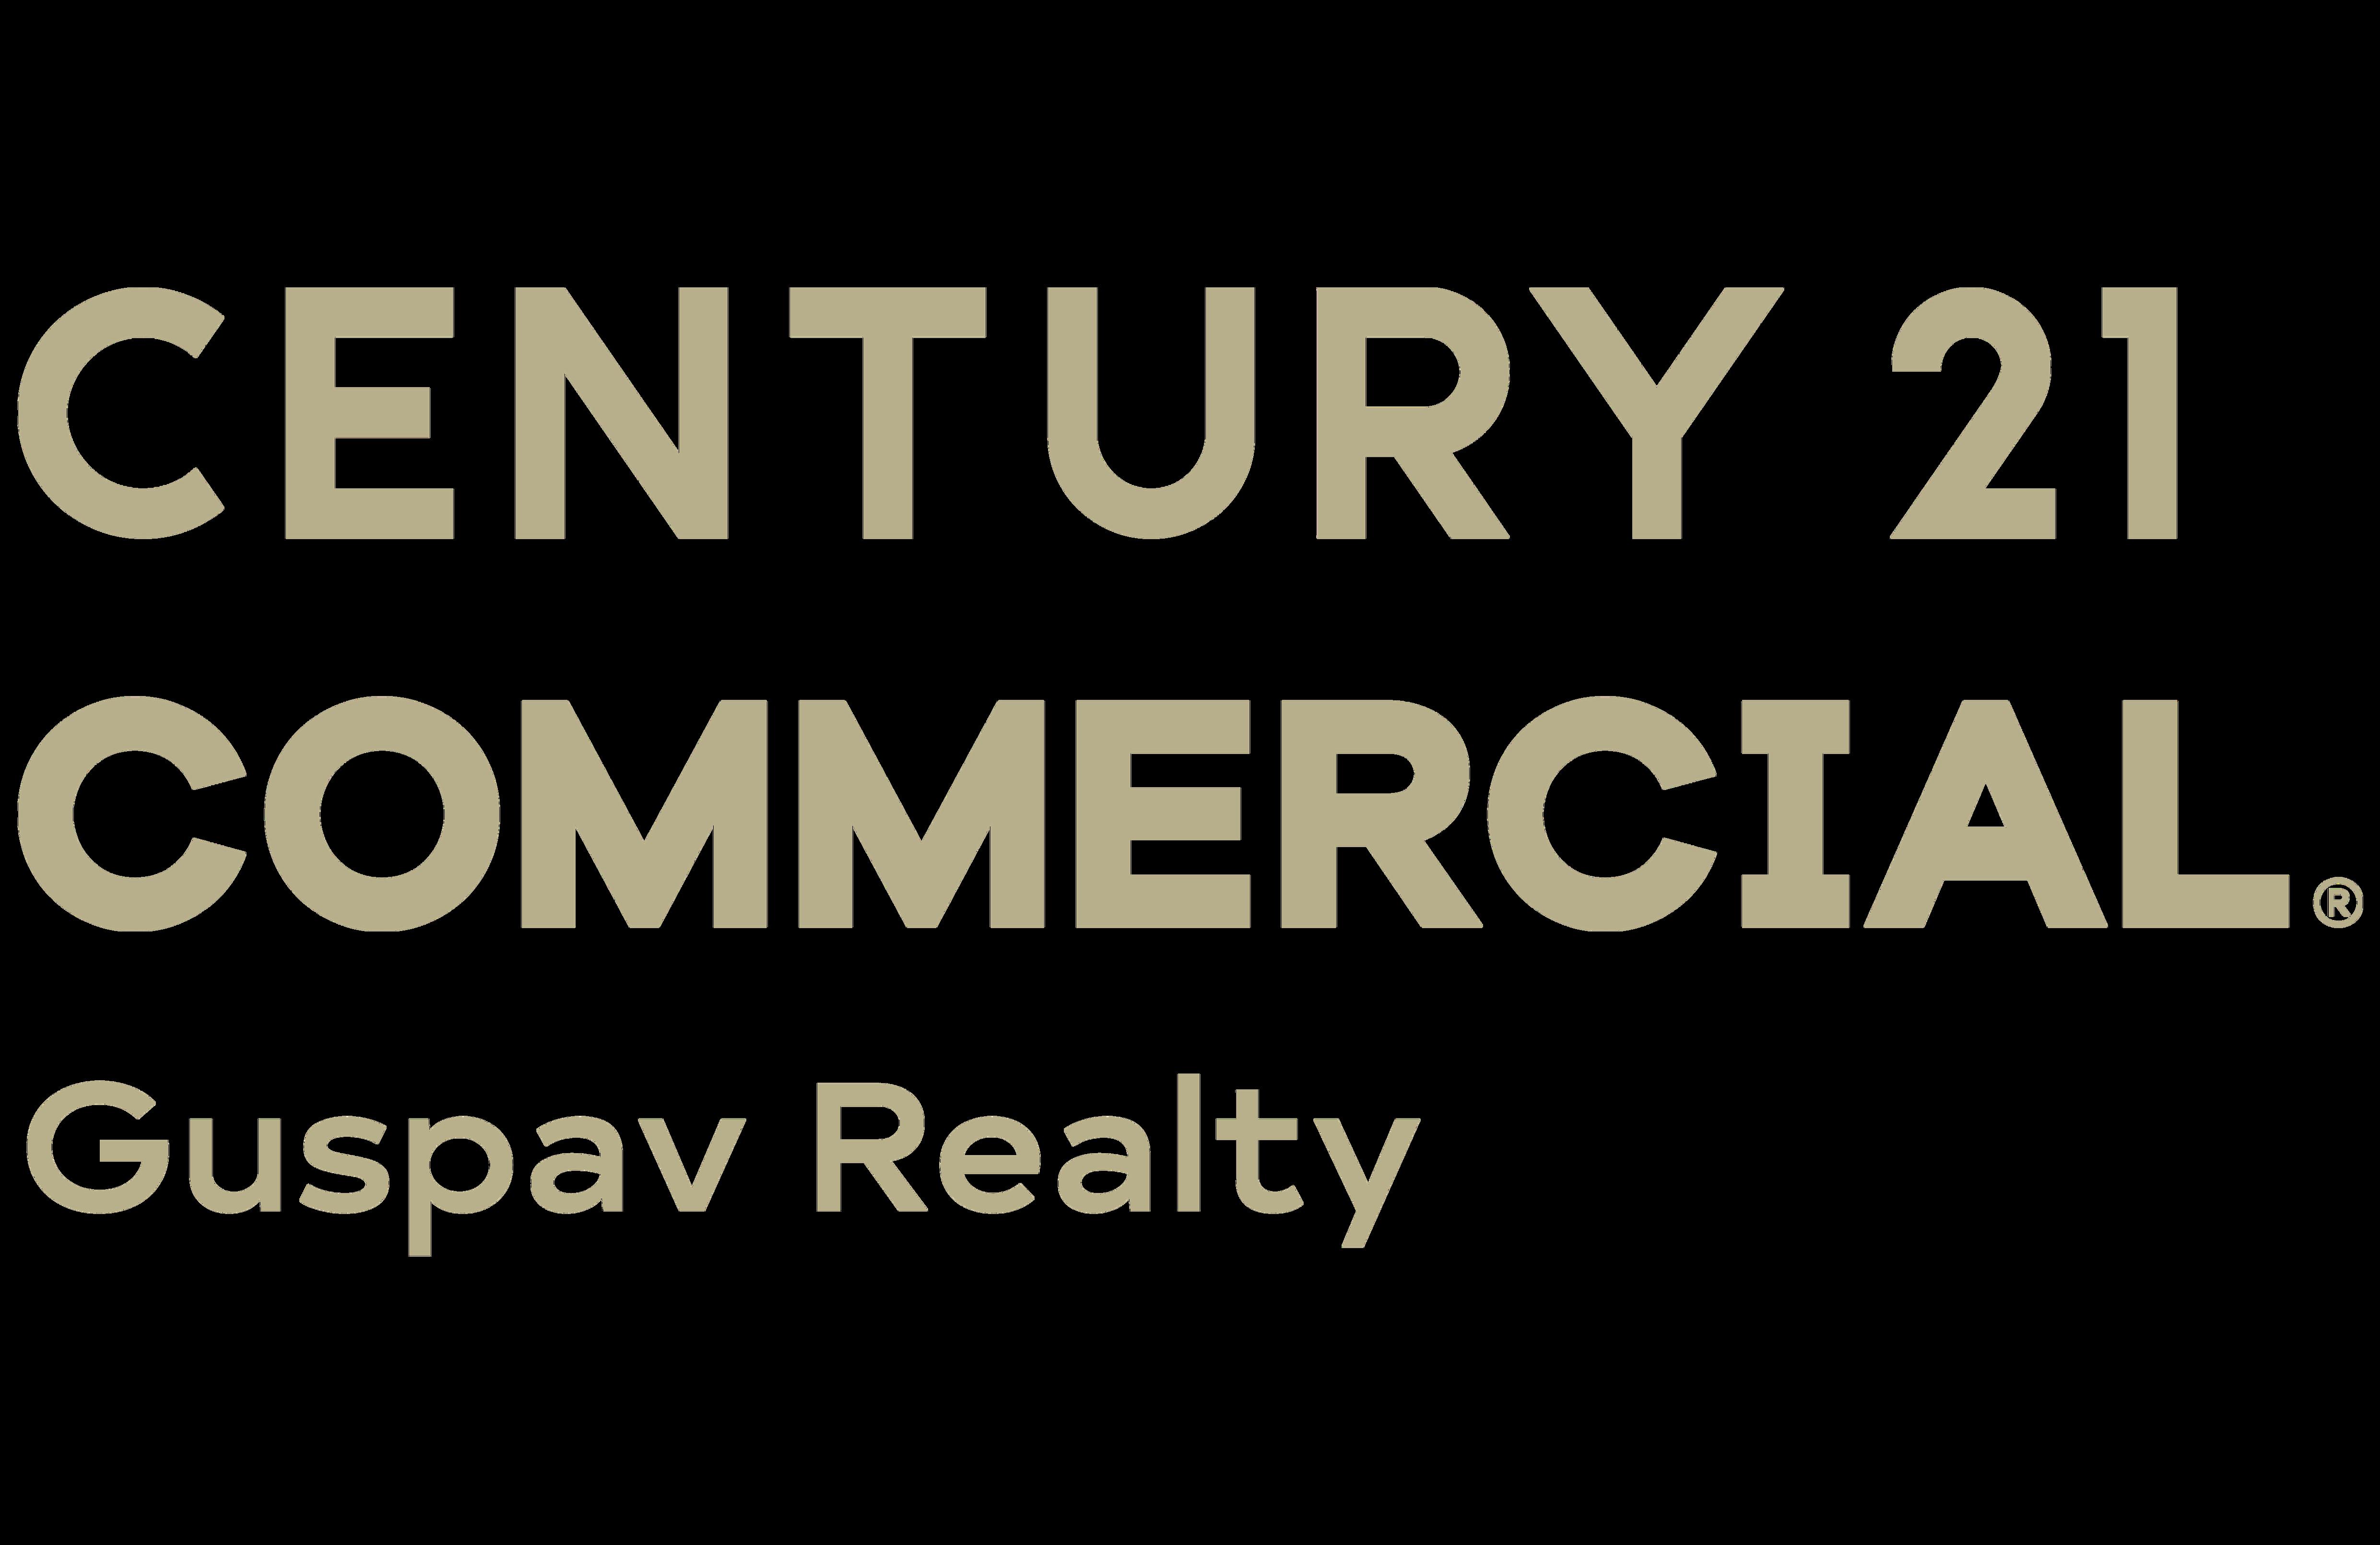 CENTURY 21 Guspav Realty